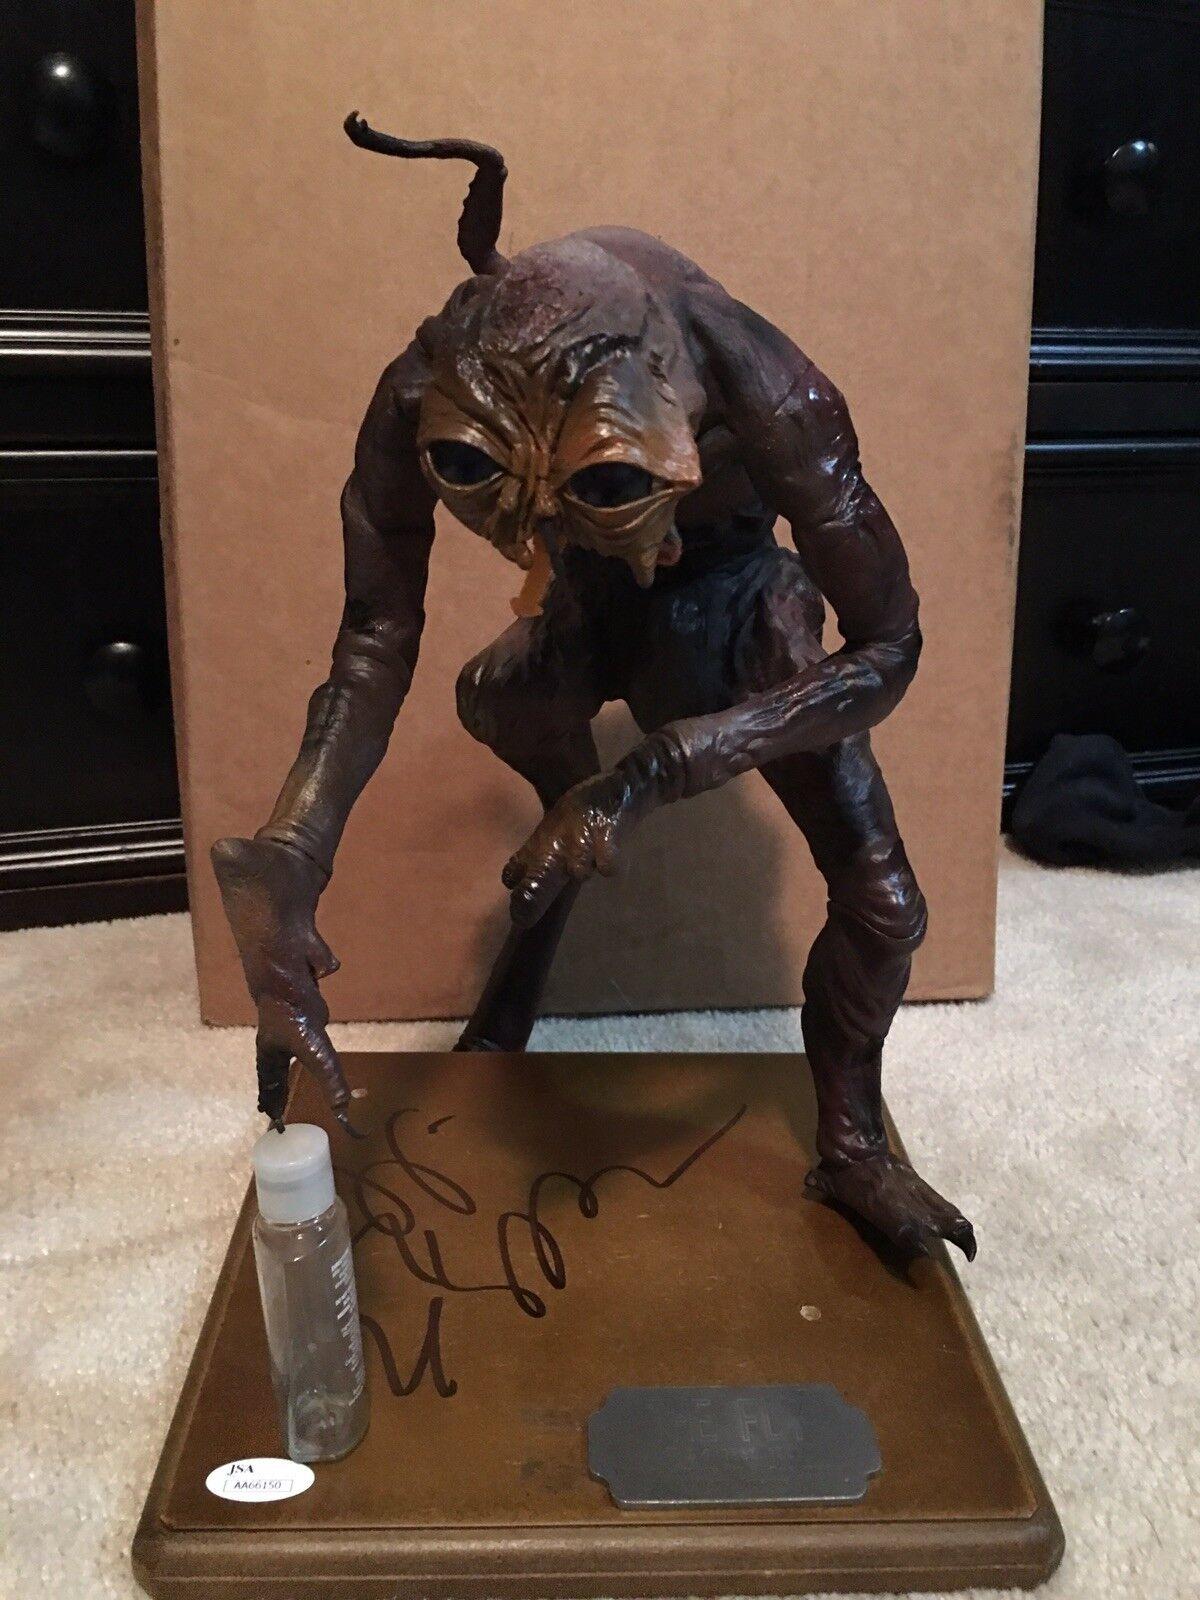 1986 Hot Toys Sideshow The Fly Statue Signed By Jeff goldbluem COA JSA